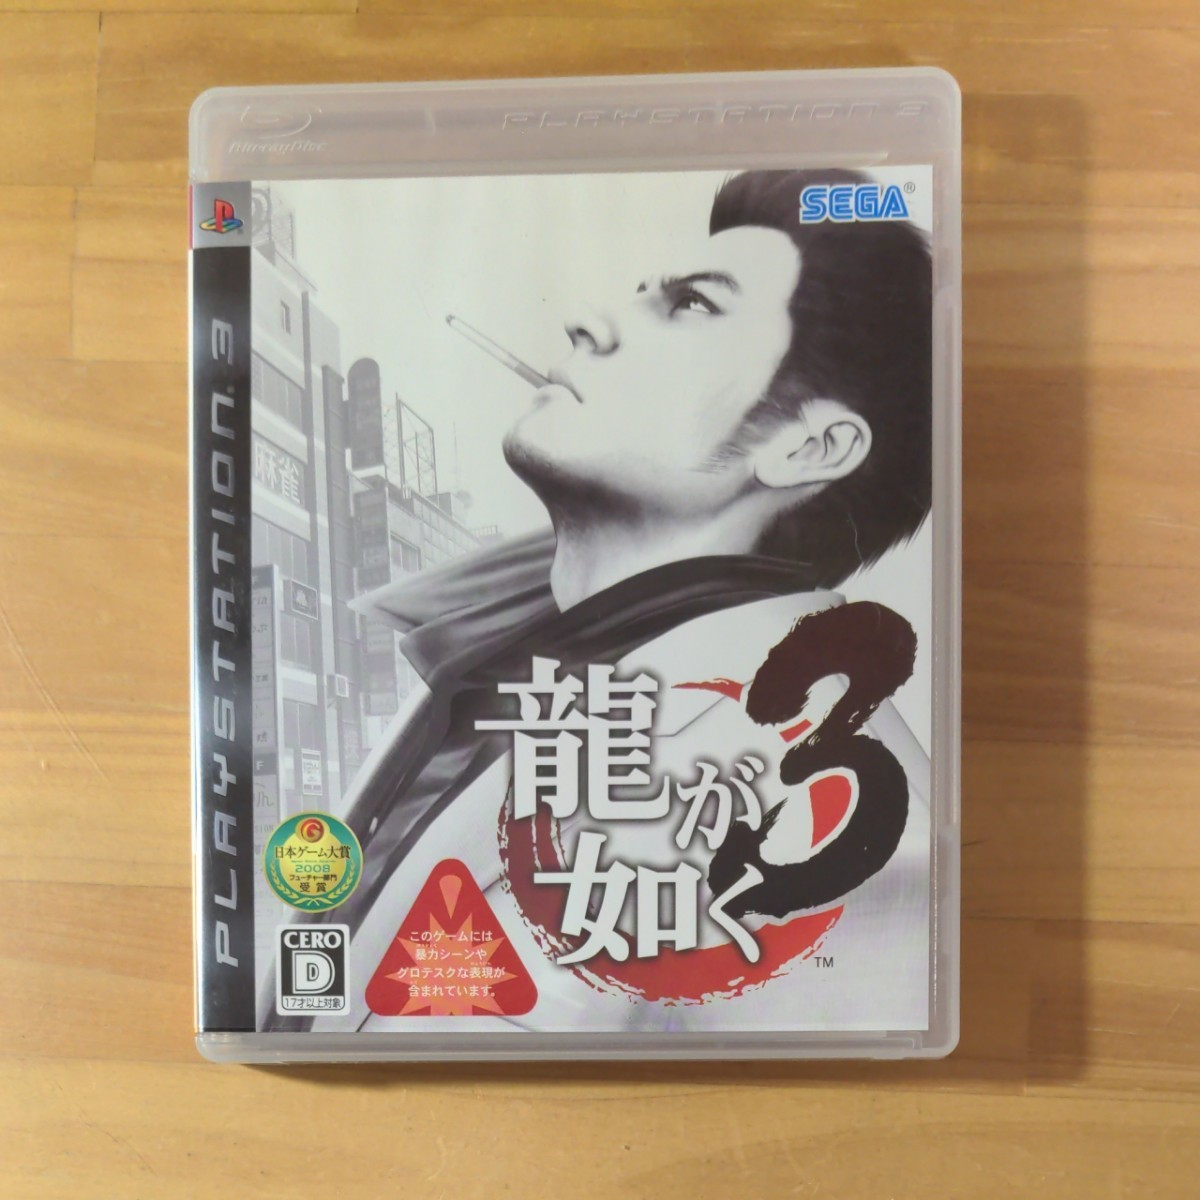 PS3ソフト 龍が如く3 プレイステーション3 SEGA